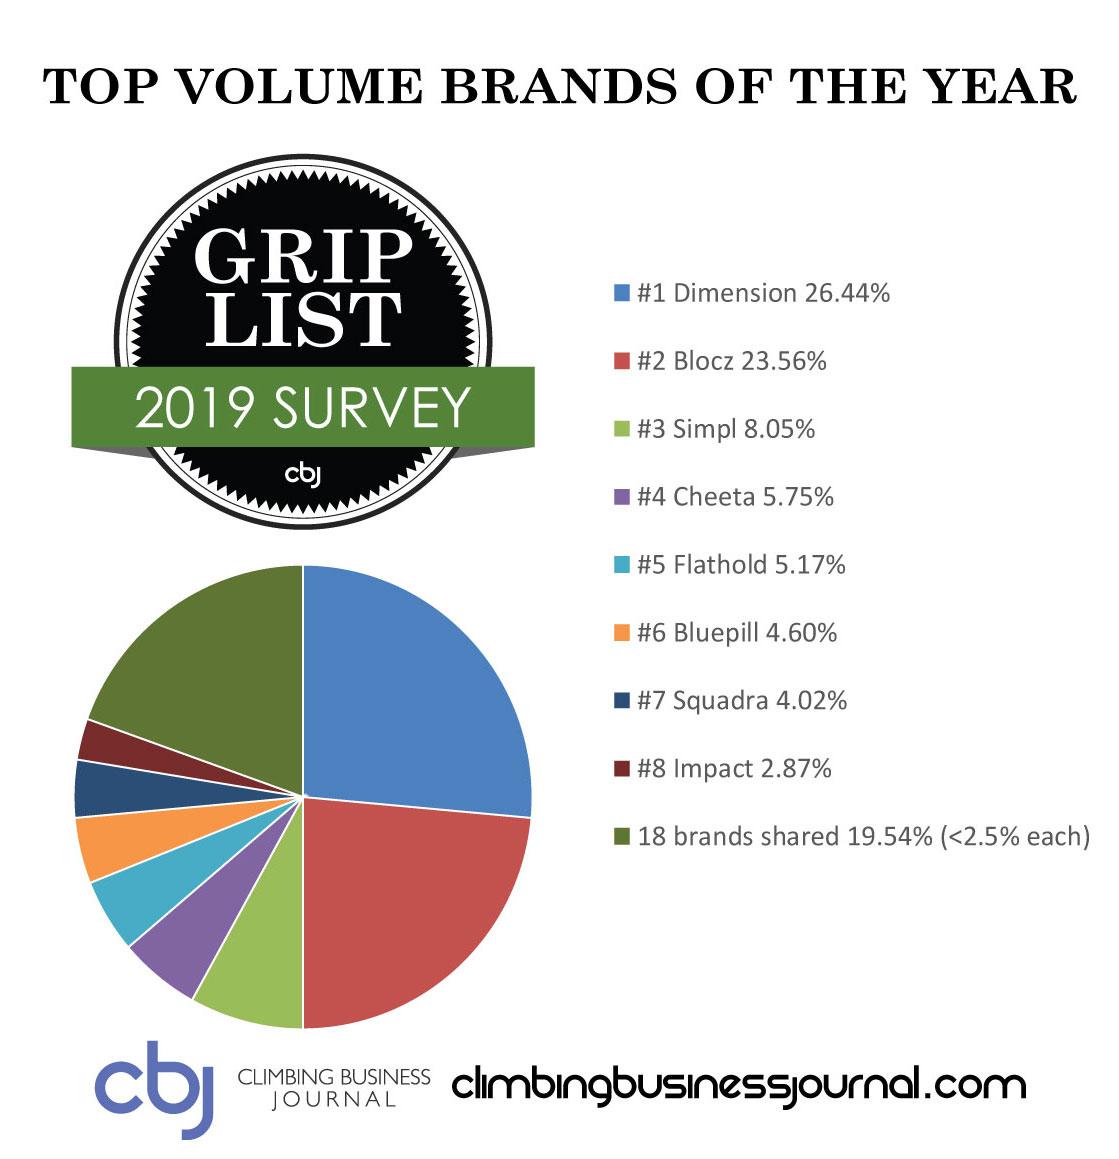 2019 Grip List top volume brands